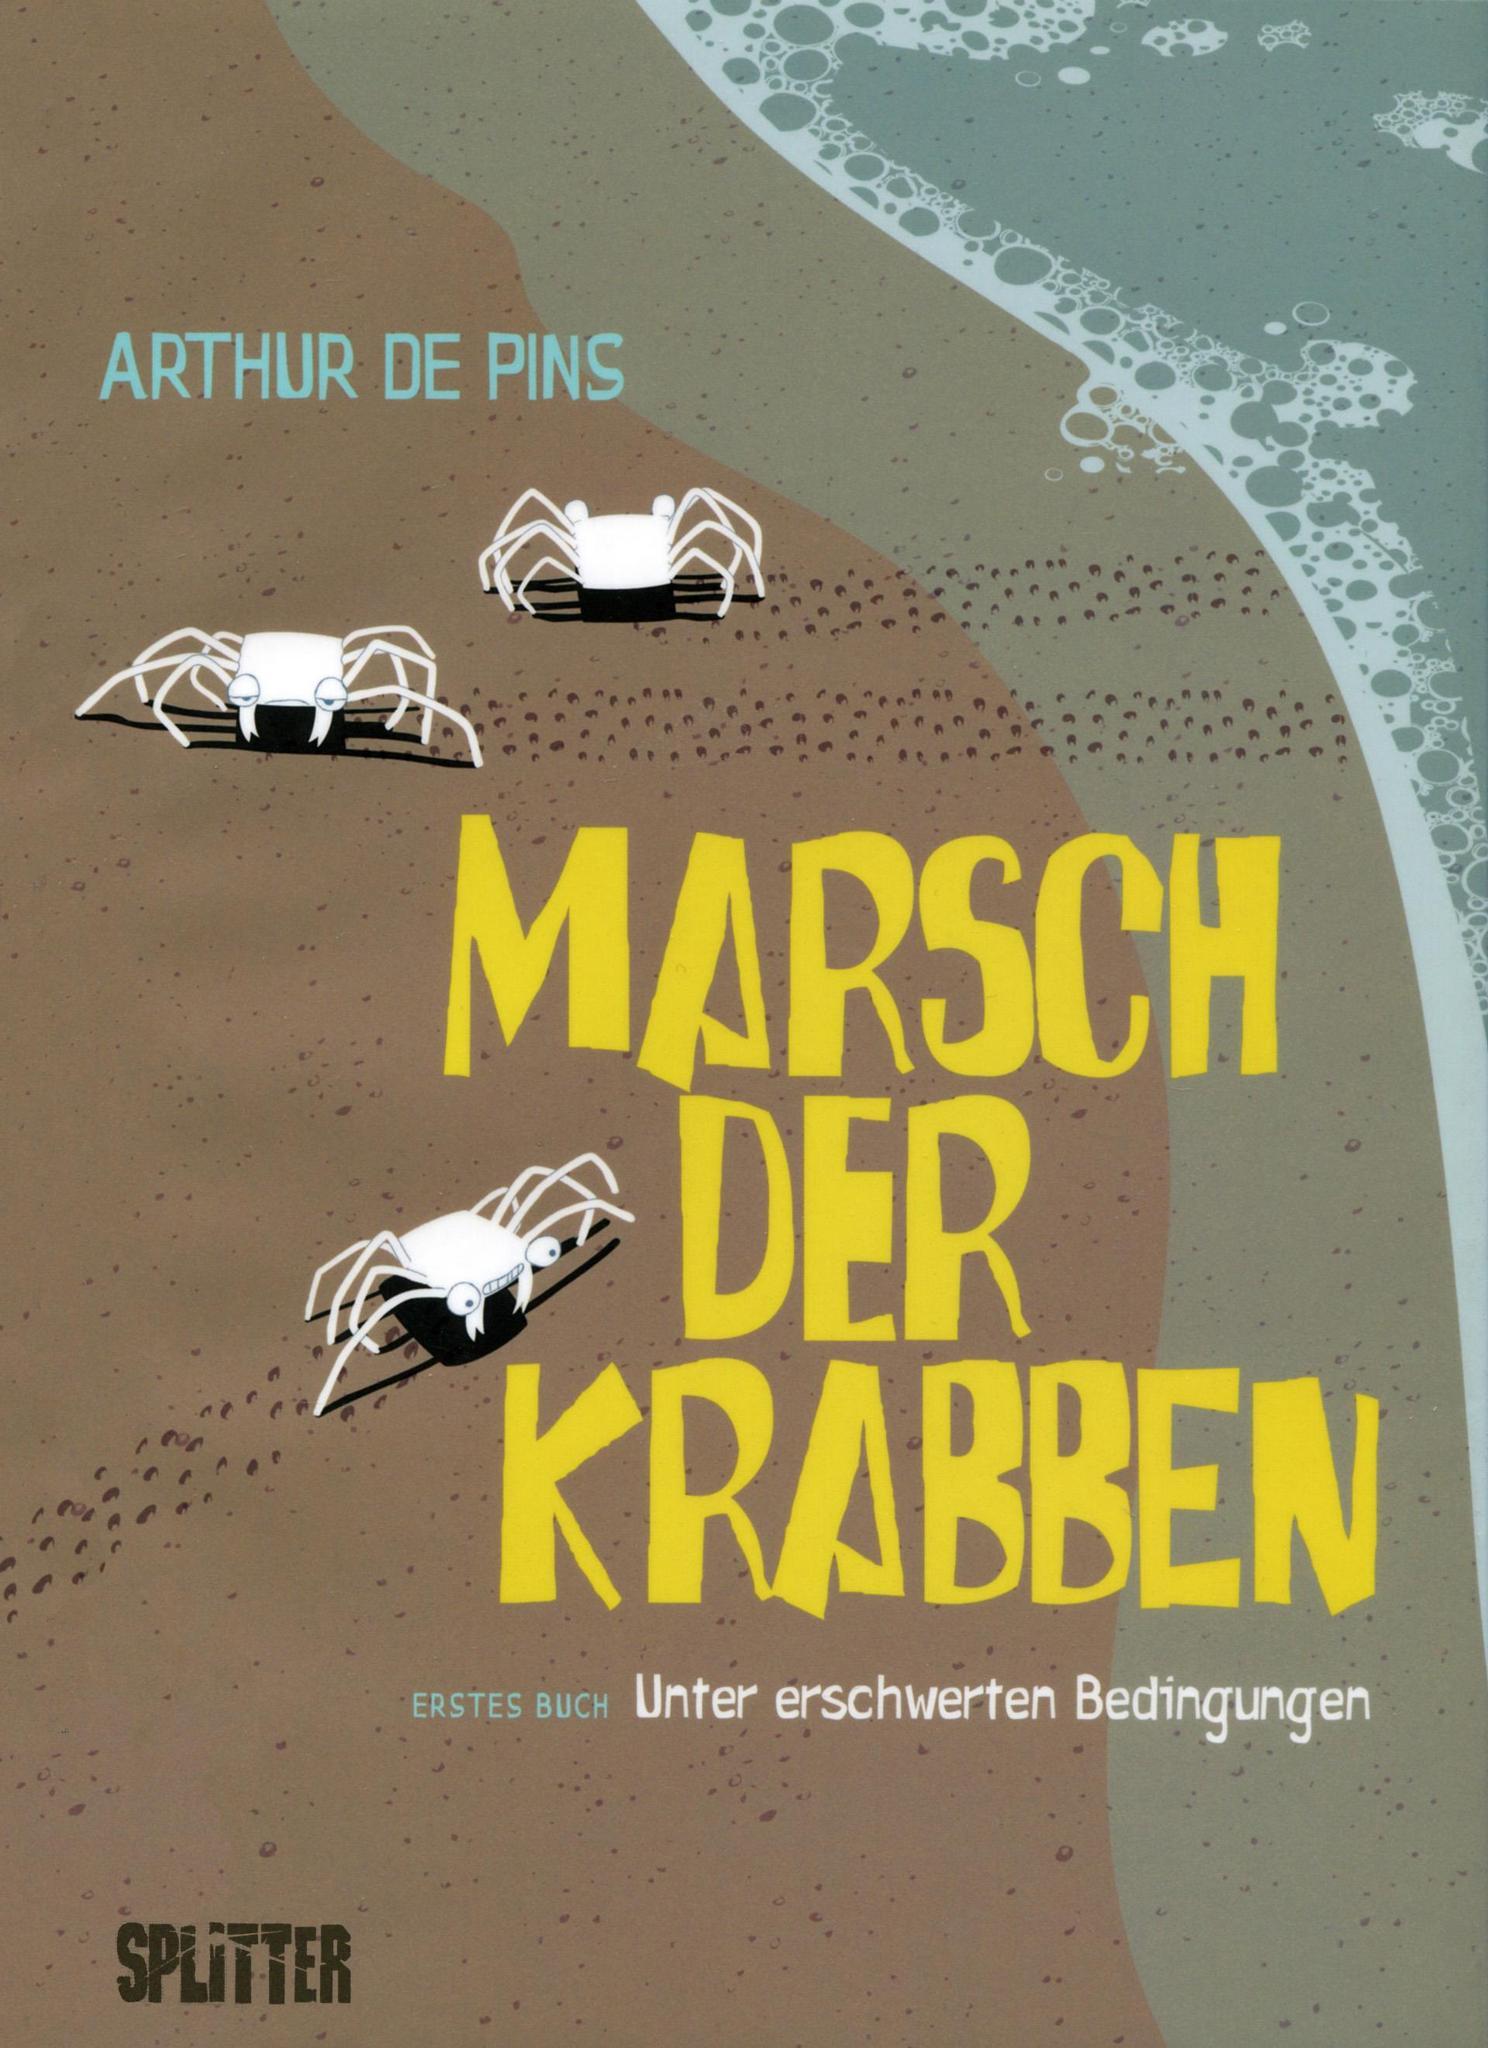 Marsch der Krabben (2012) - komplett